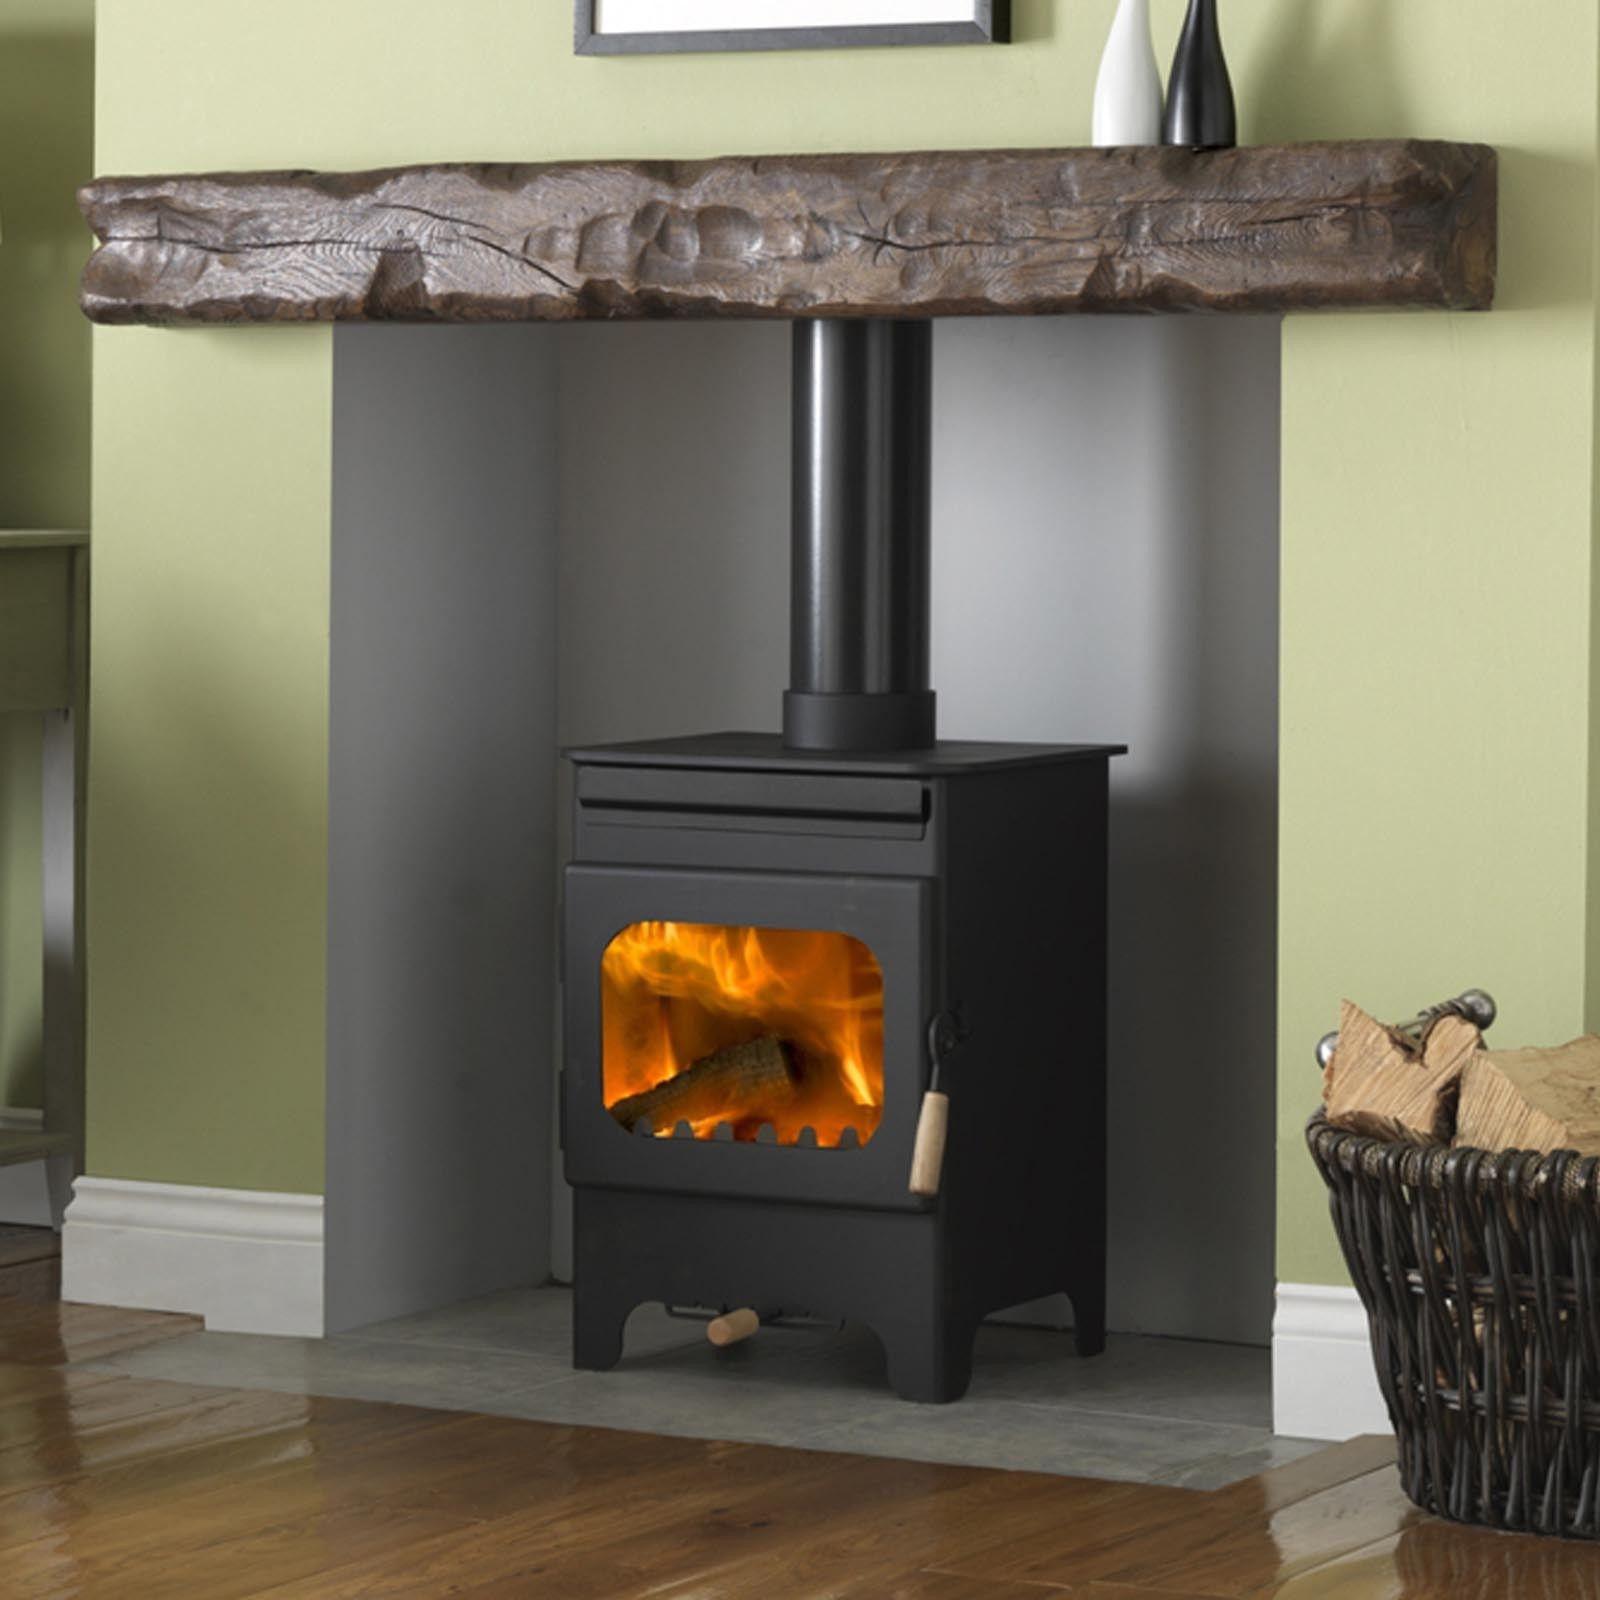 Free Uk Shipping Burley Fireball Debdale Wood Burning Stove Huge Savings Freestanding Fireplace Burley Stove Wood Burning Stove